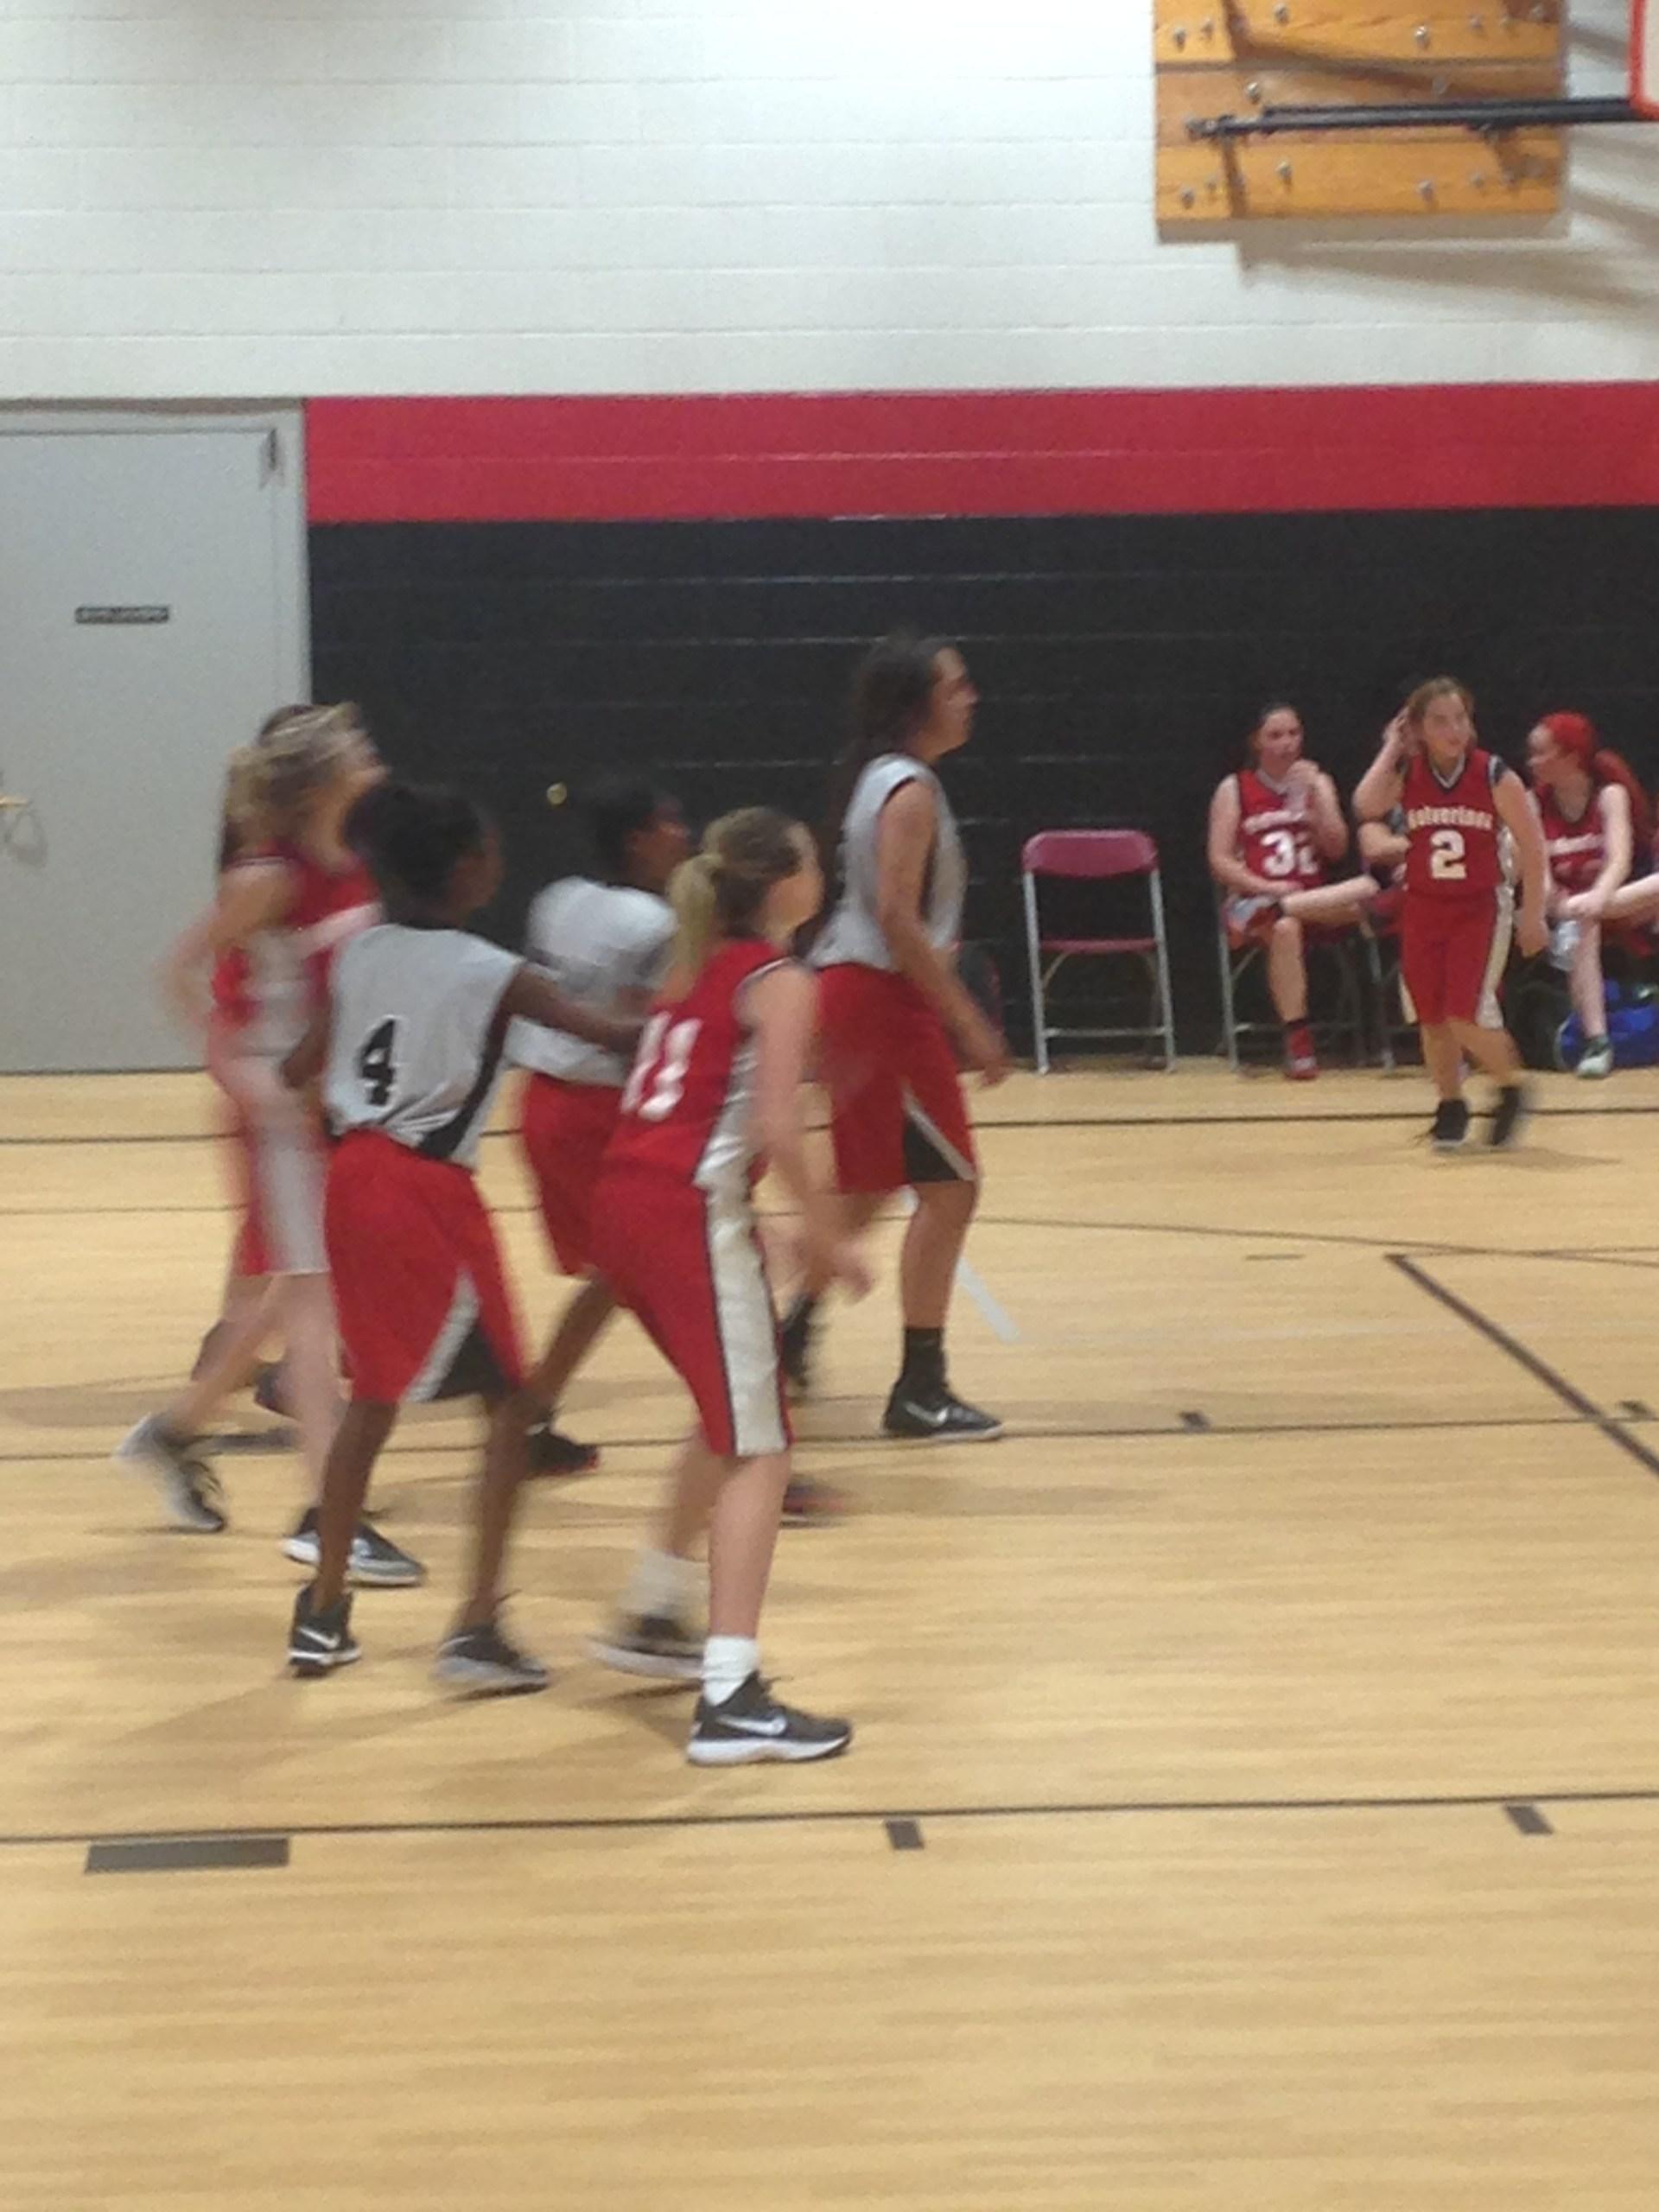 Girls basketball game.